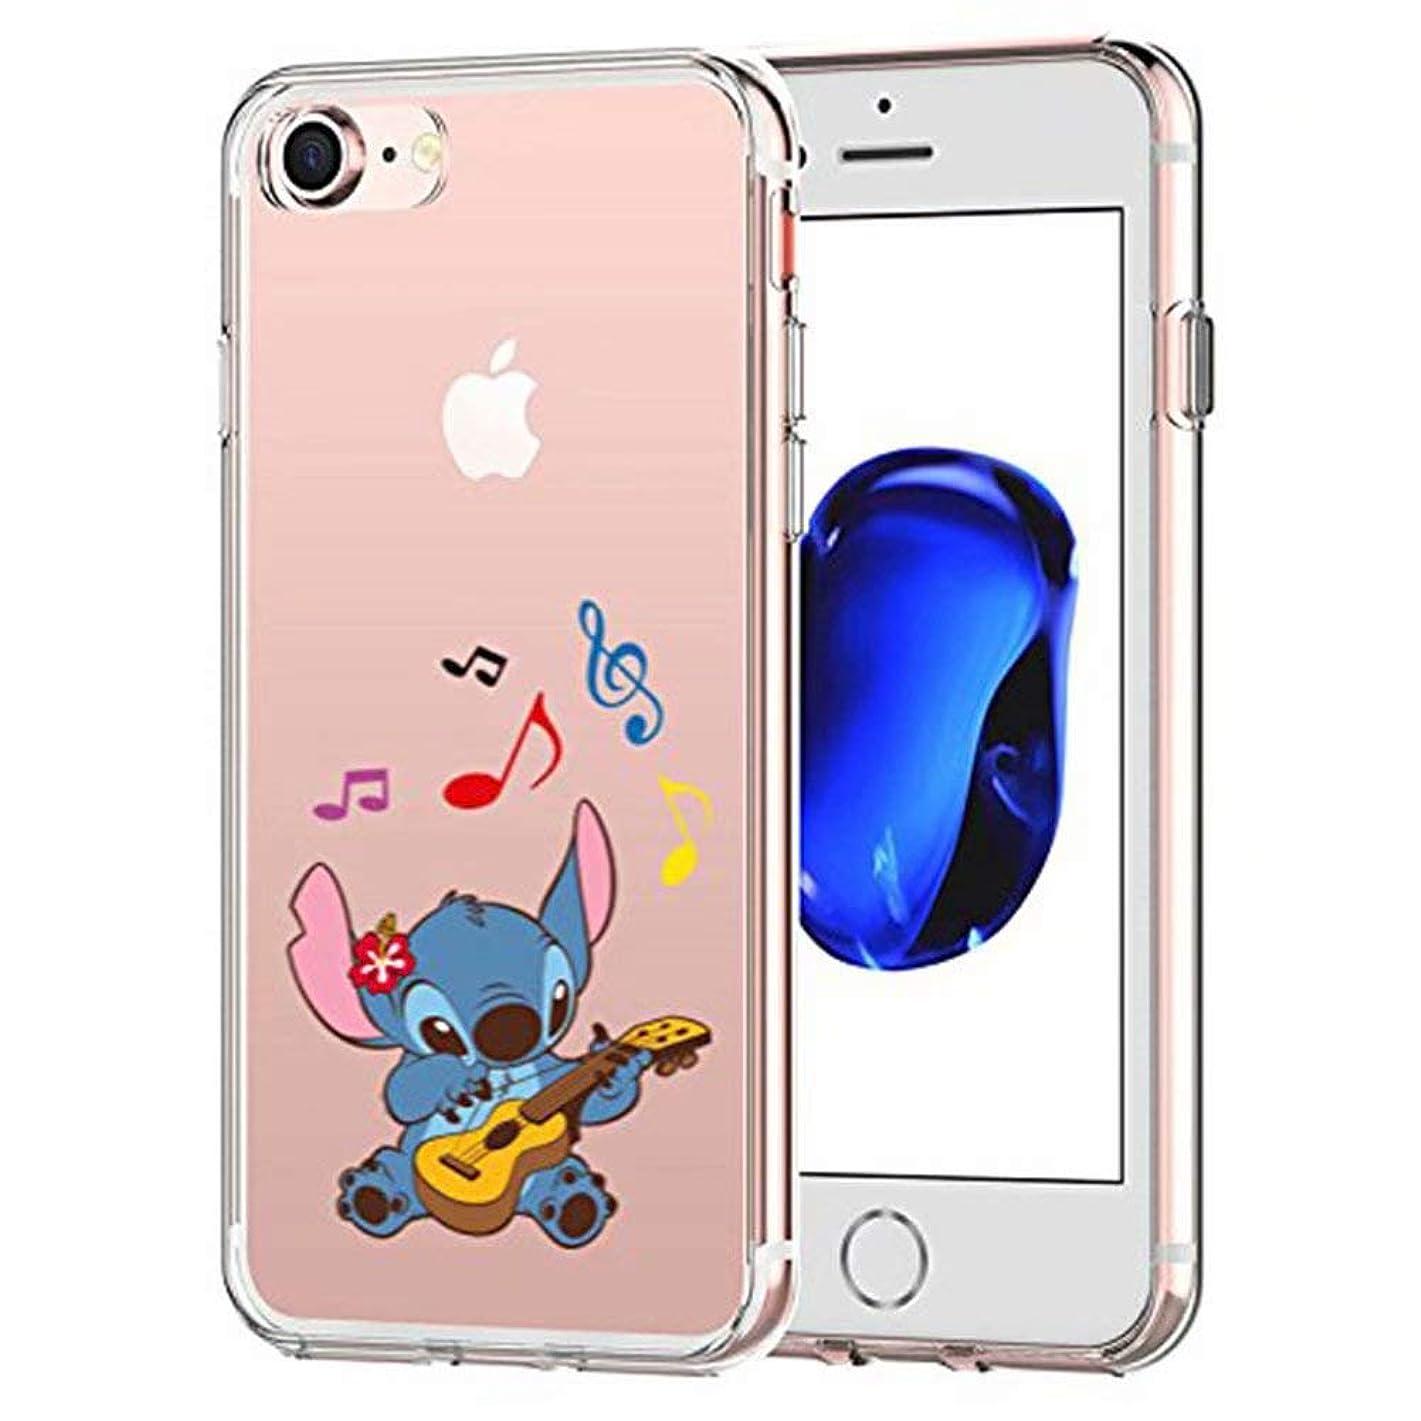 iPhone X/XS Phone Case,Ultra Slim Transparent TPU Shockproof and Anti-Scratch Case Cover- Customizable Patterns [LZX20190404]